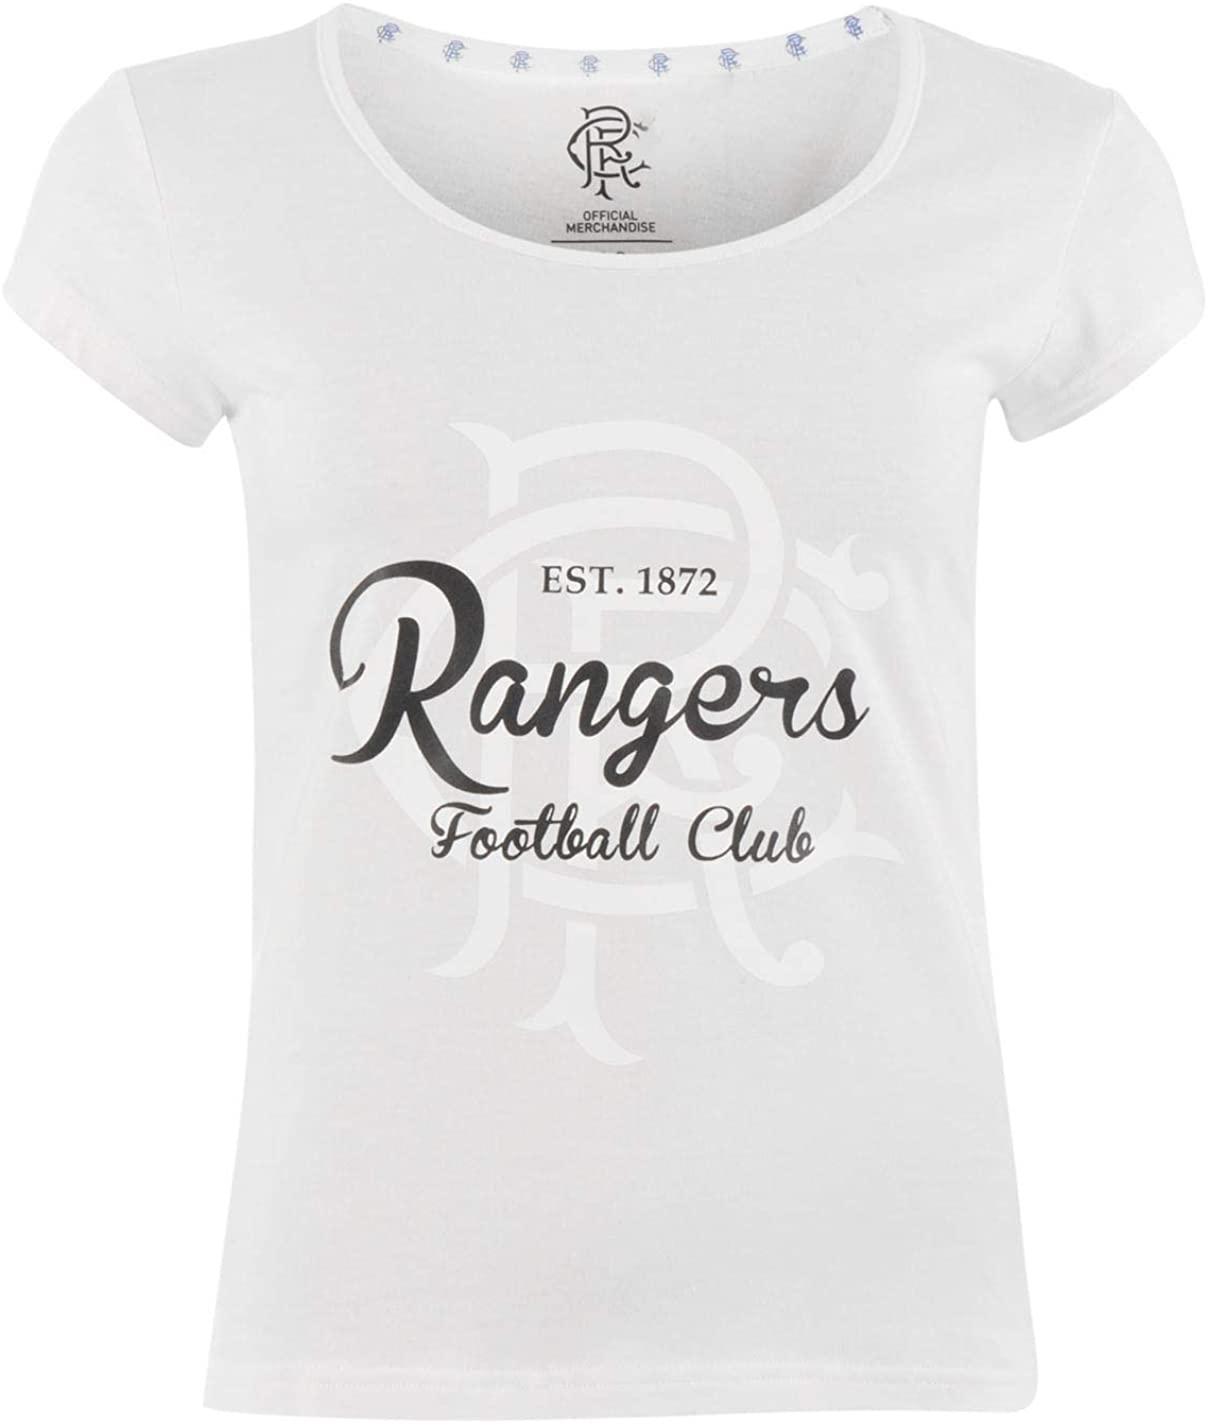 Glasgow Rangers Crest Print T-Shirt Womens Football Soccer Fan Top Tee Shirt White UK 8 (X-Small)